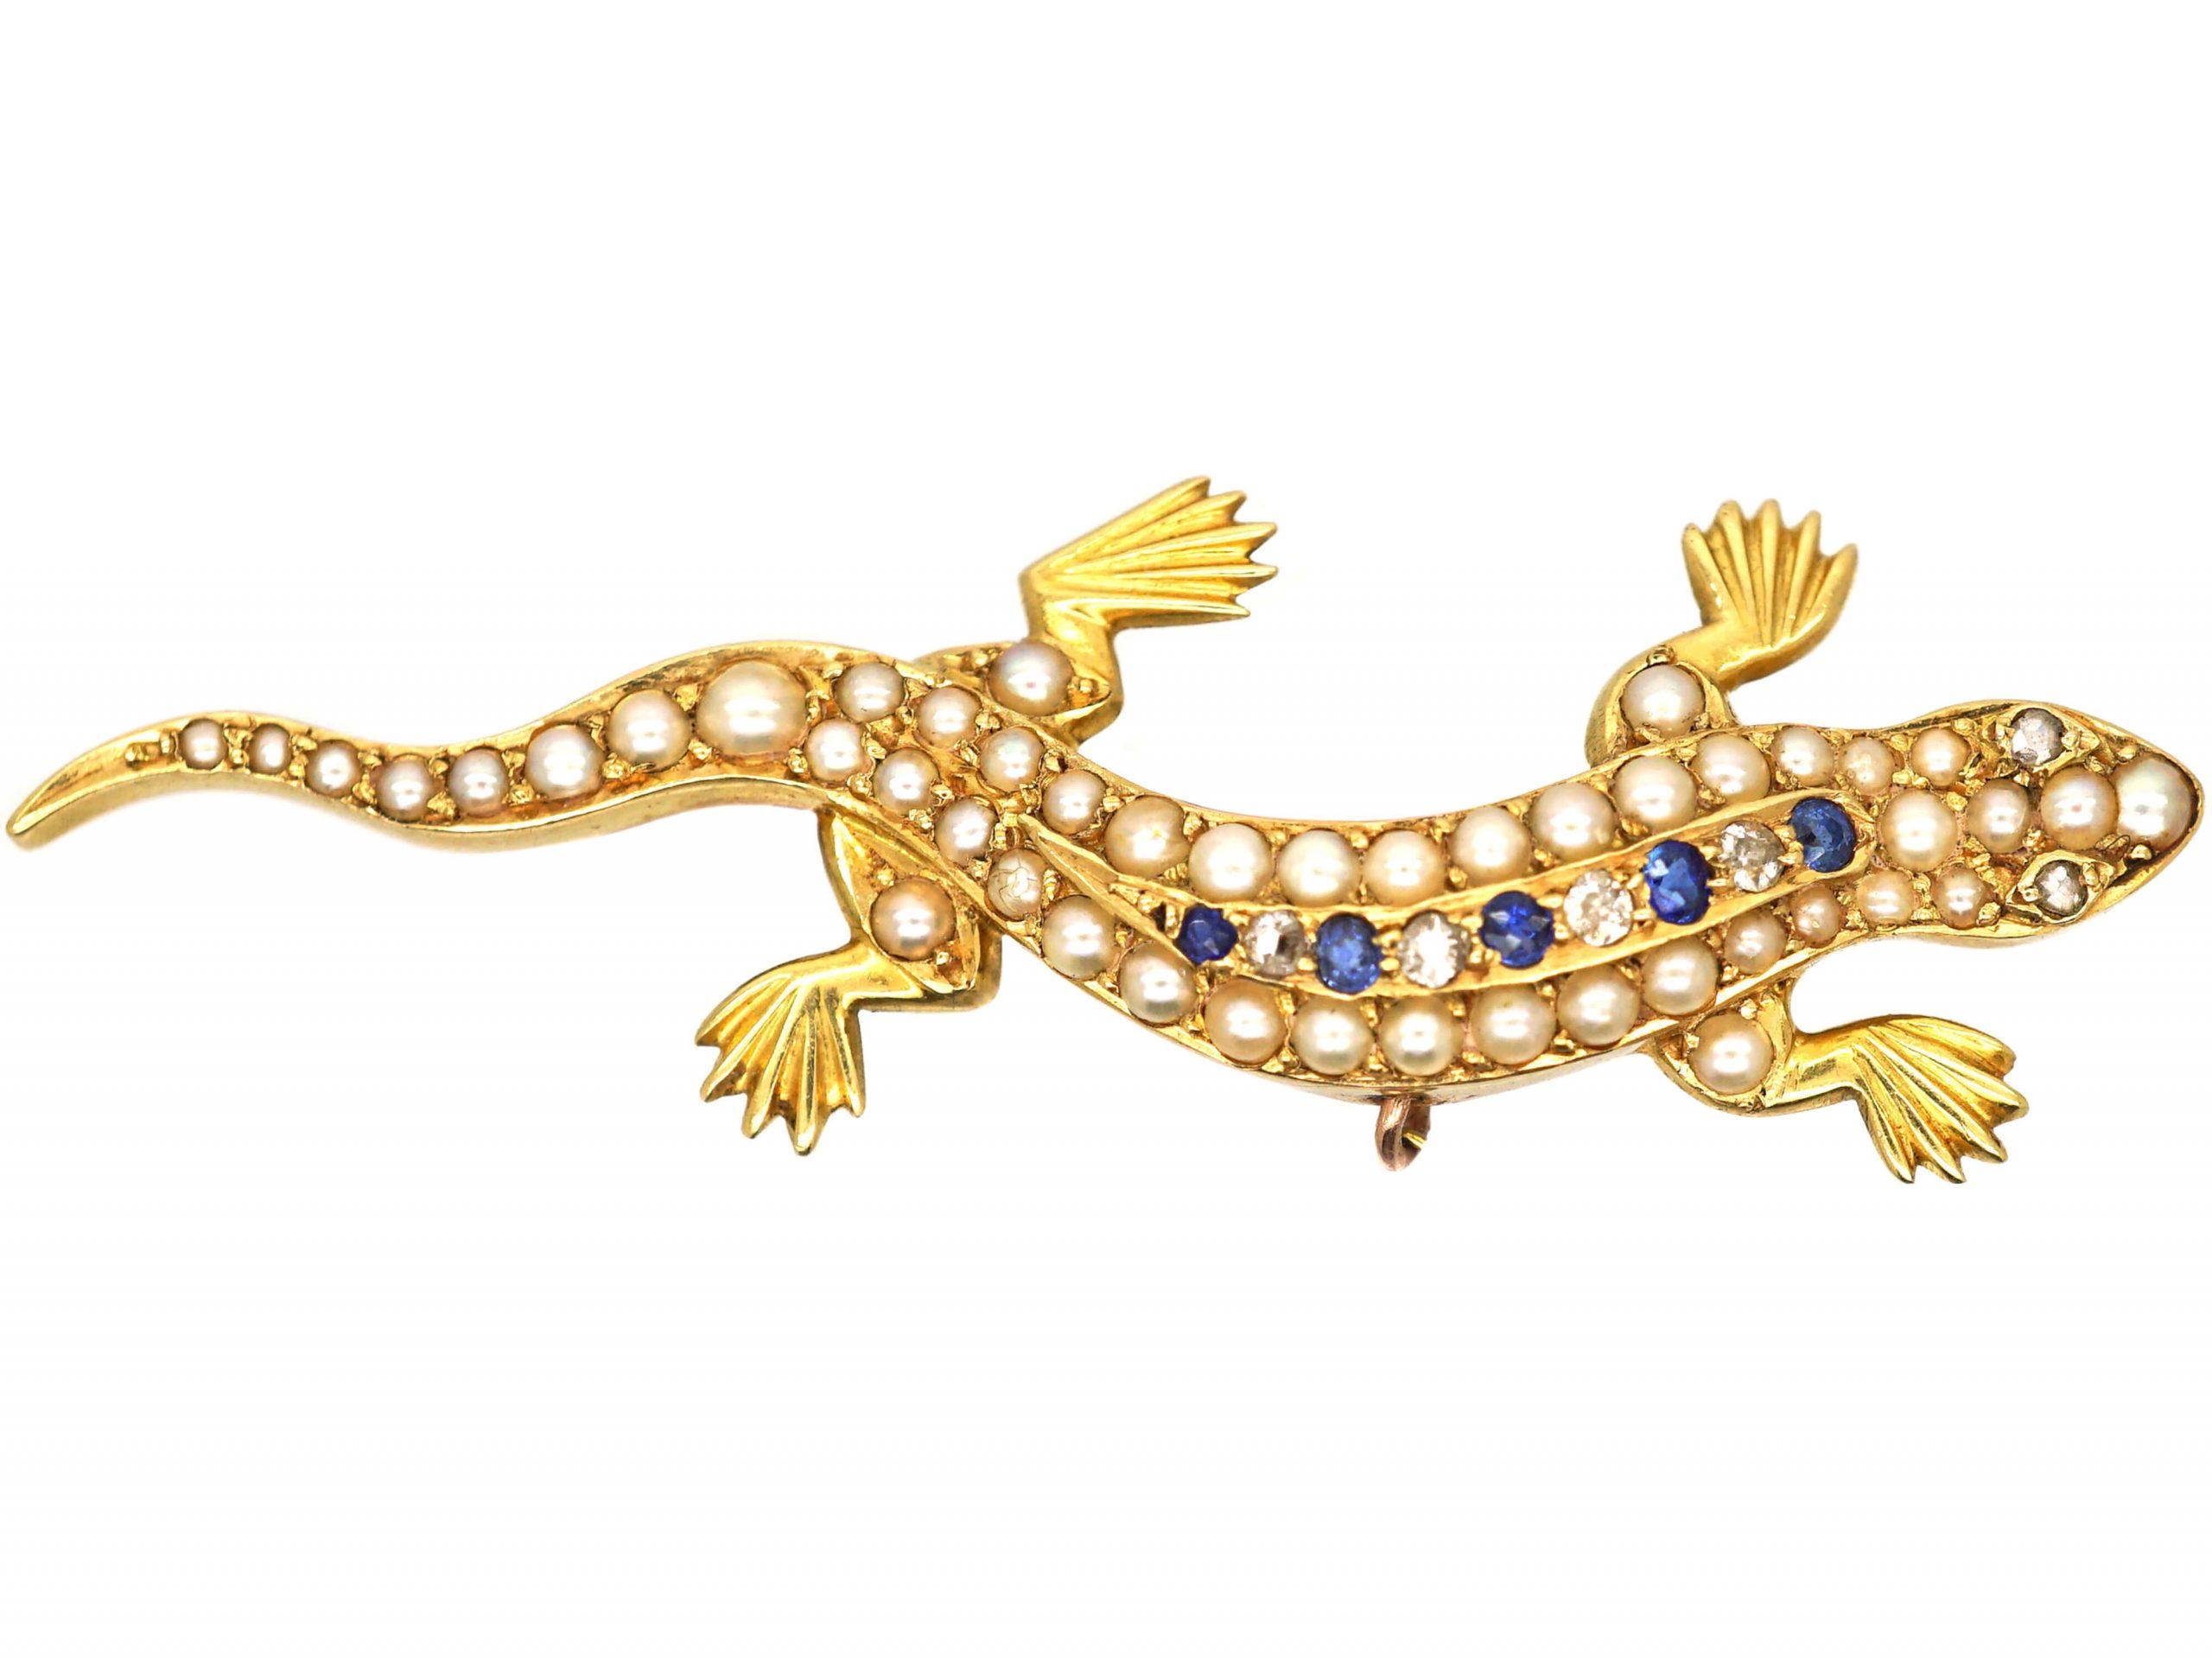 Edwardian 15ct Gold, Sapphire, Diamond & Natural Split Pearl Lizard brooch